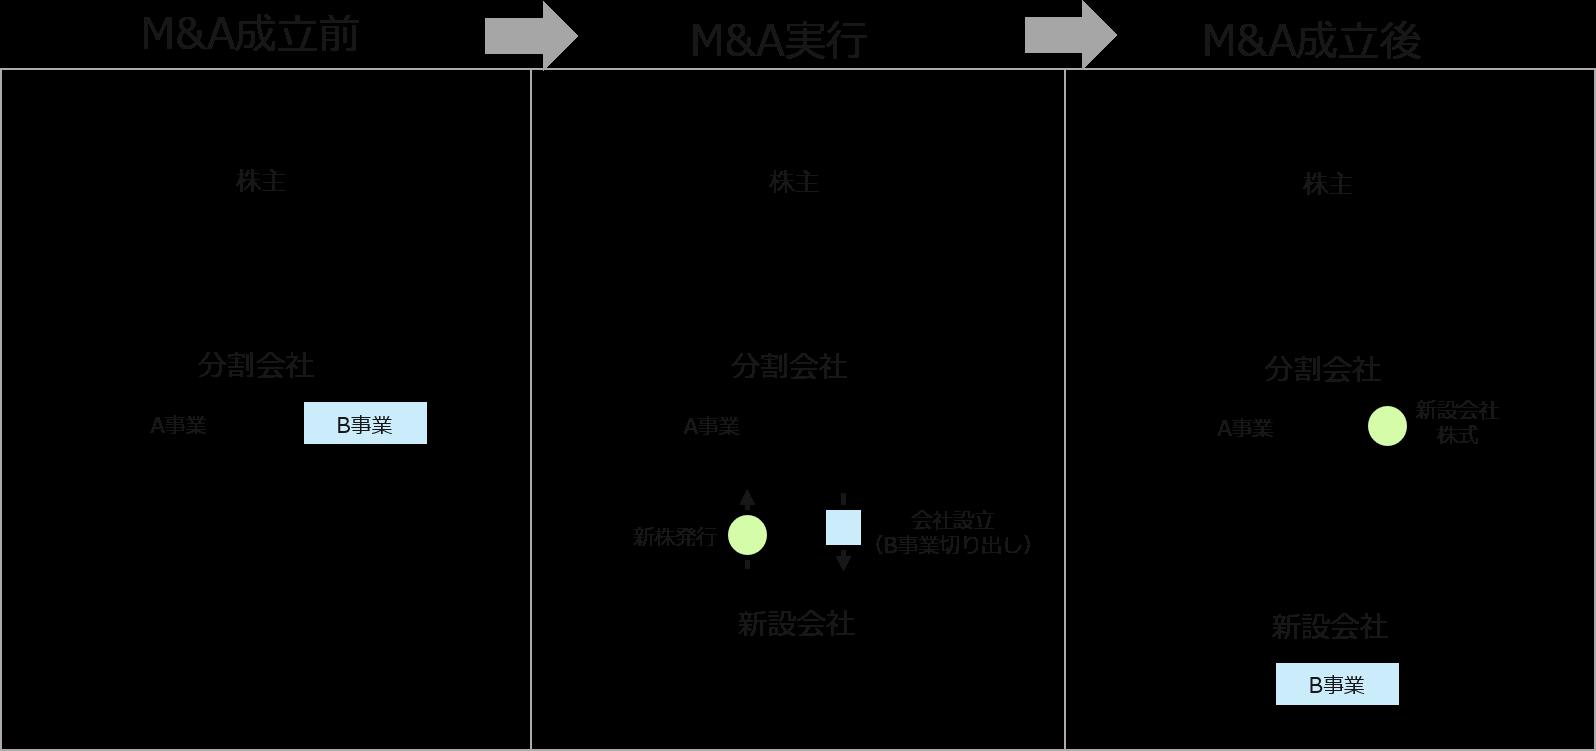 M&A(エムアンドエー)のスキーム 会社分割(単独型新設分社型分割)の図